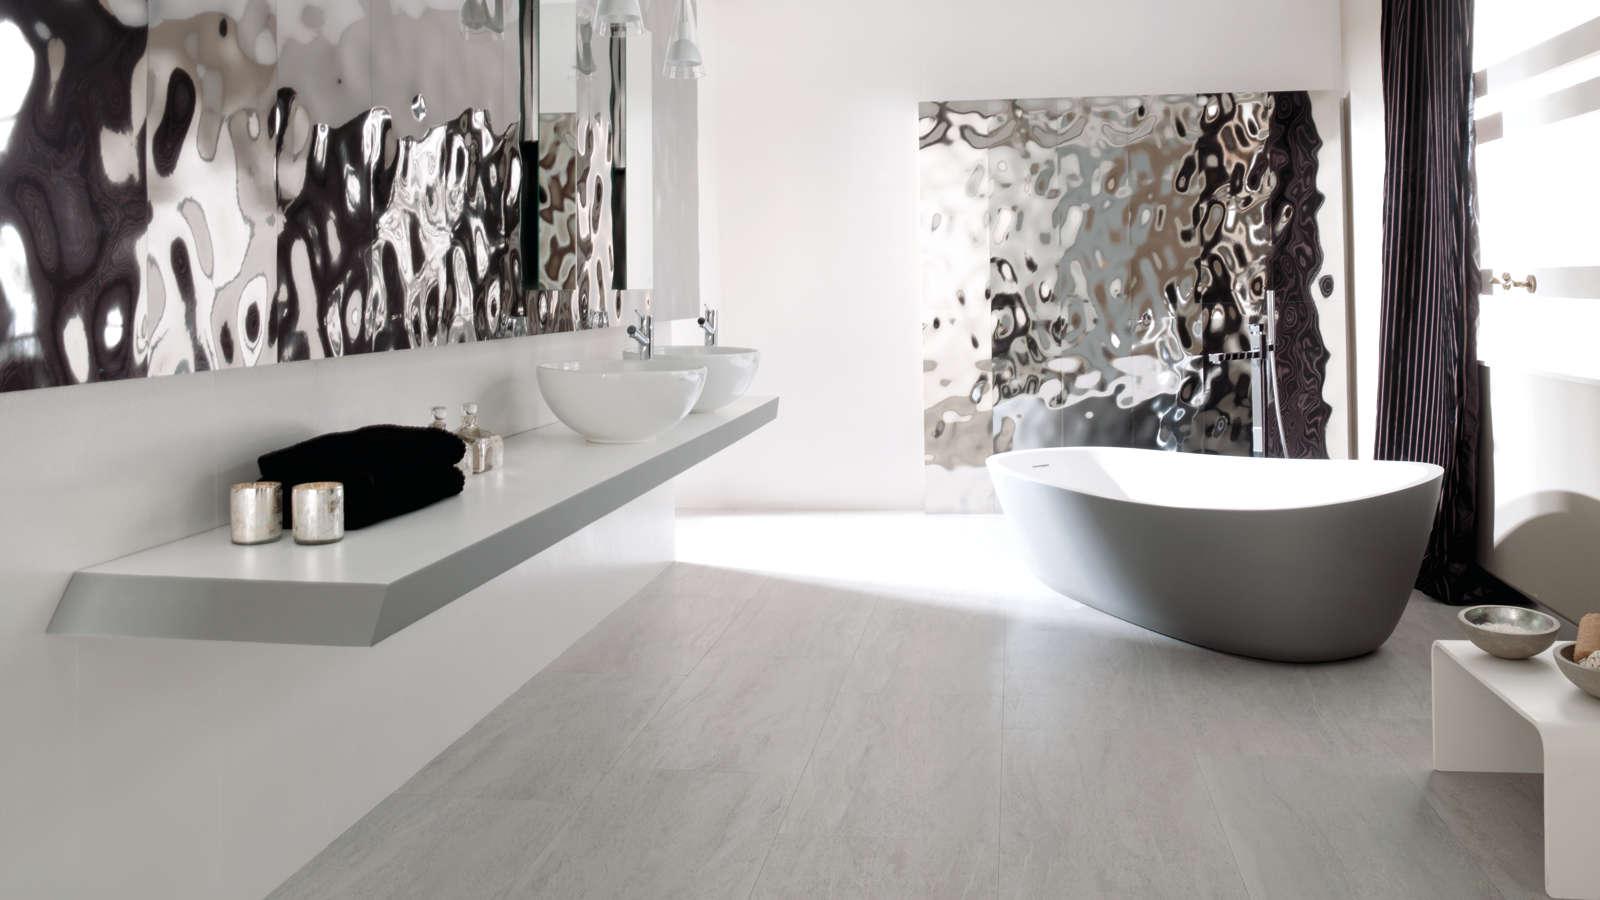 Porcelanosa Sea Silver 33.3x100 Ace Basic Blanco 33.3x100 Madagascar Natural 44x66